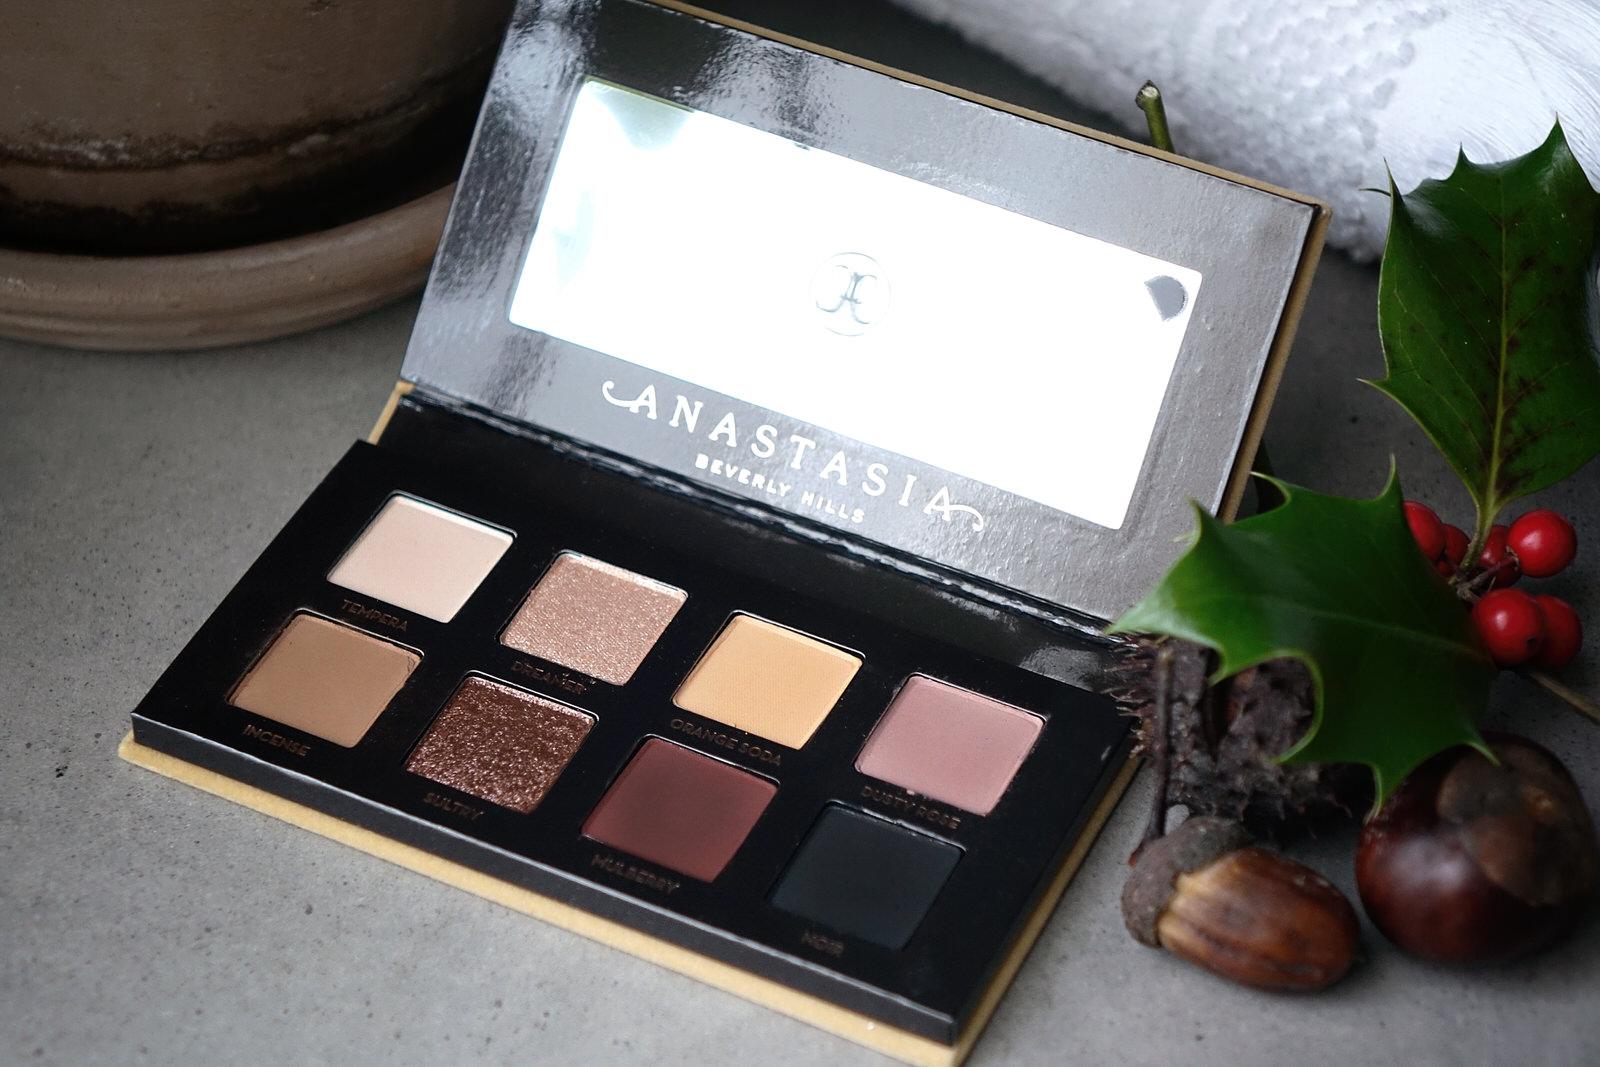 Palette Soft Glam 2, mini de Anastasia Beverly Hills